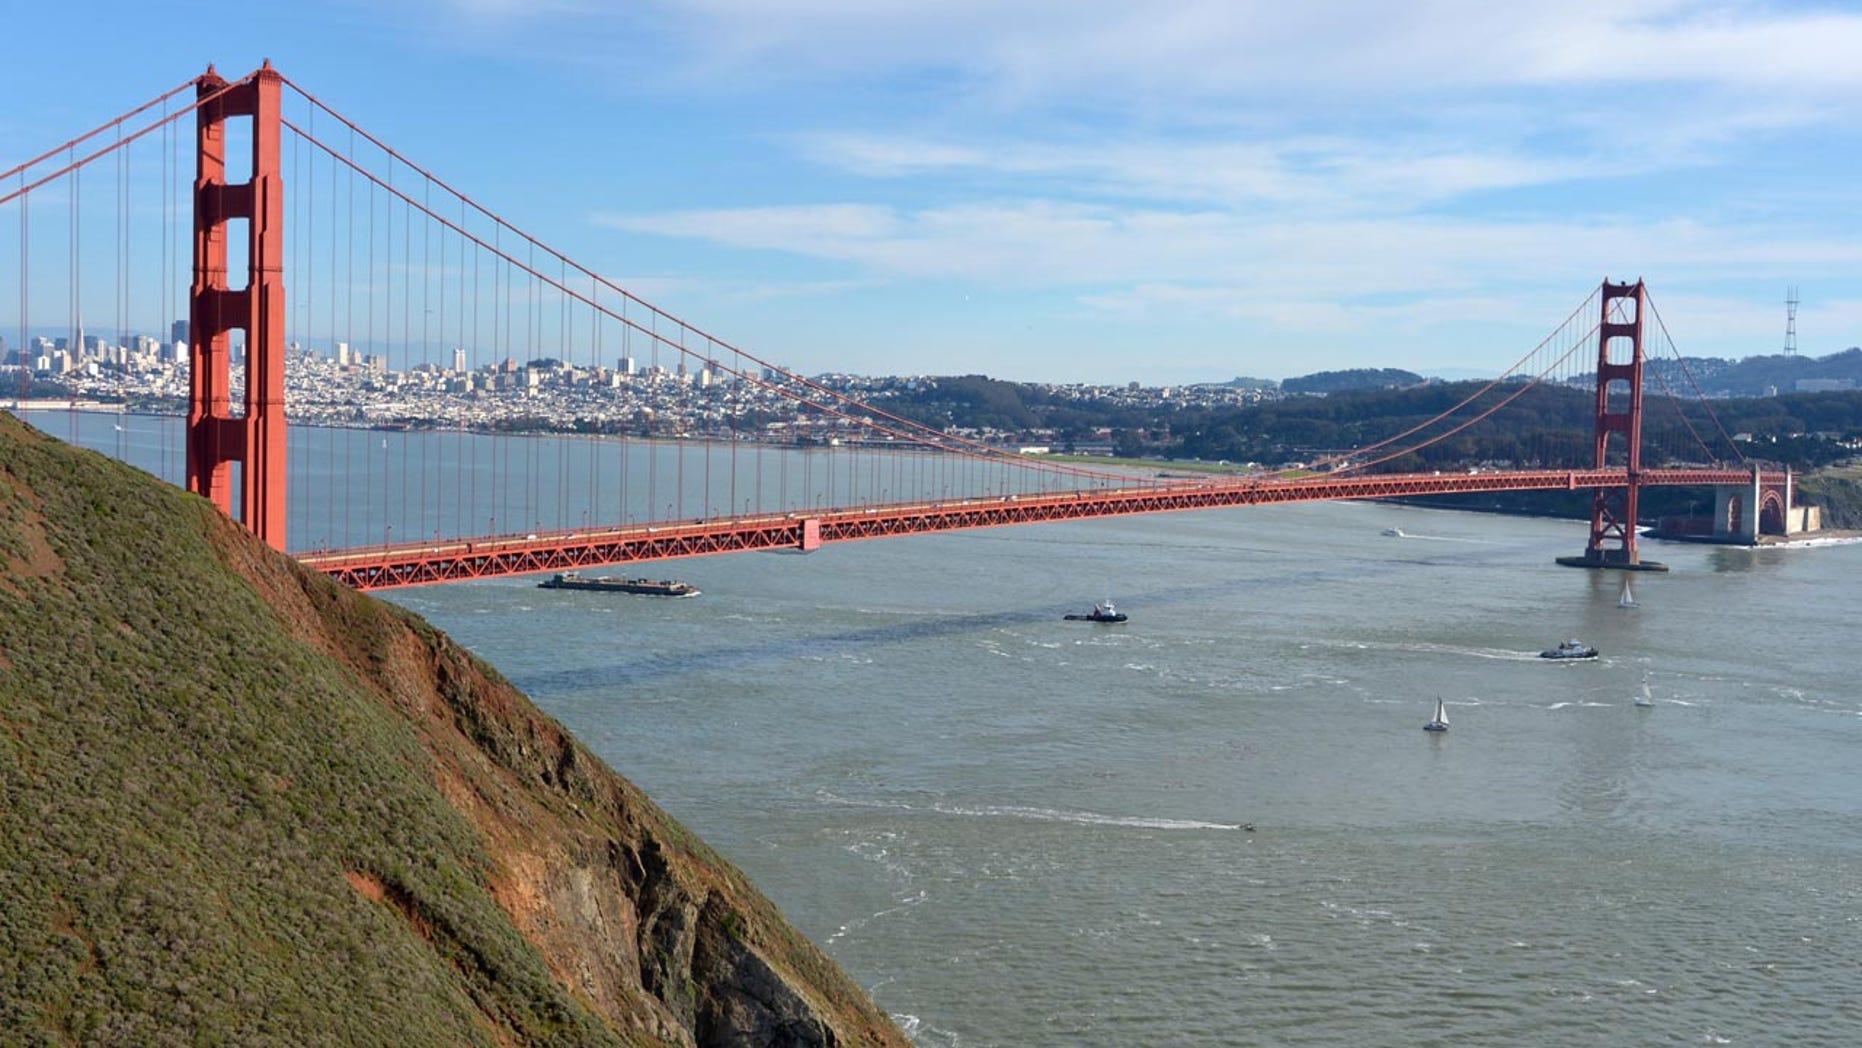 FILE 2016: An emergency alert raised eyebrows in San Francisco on Wednesday.